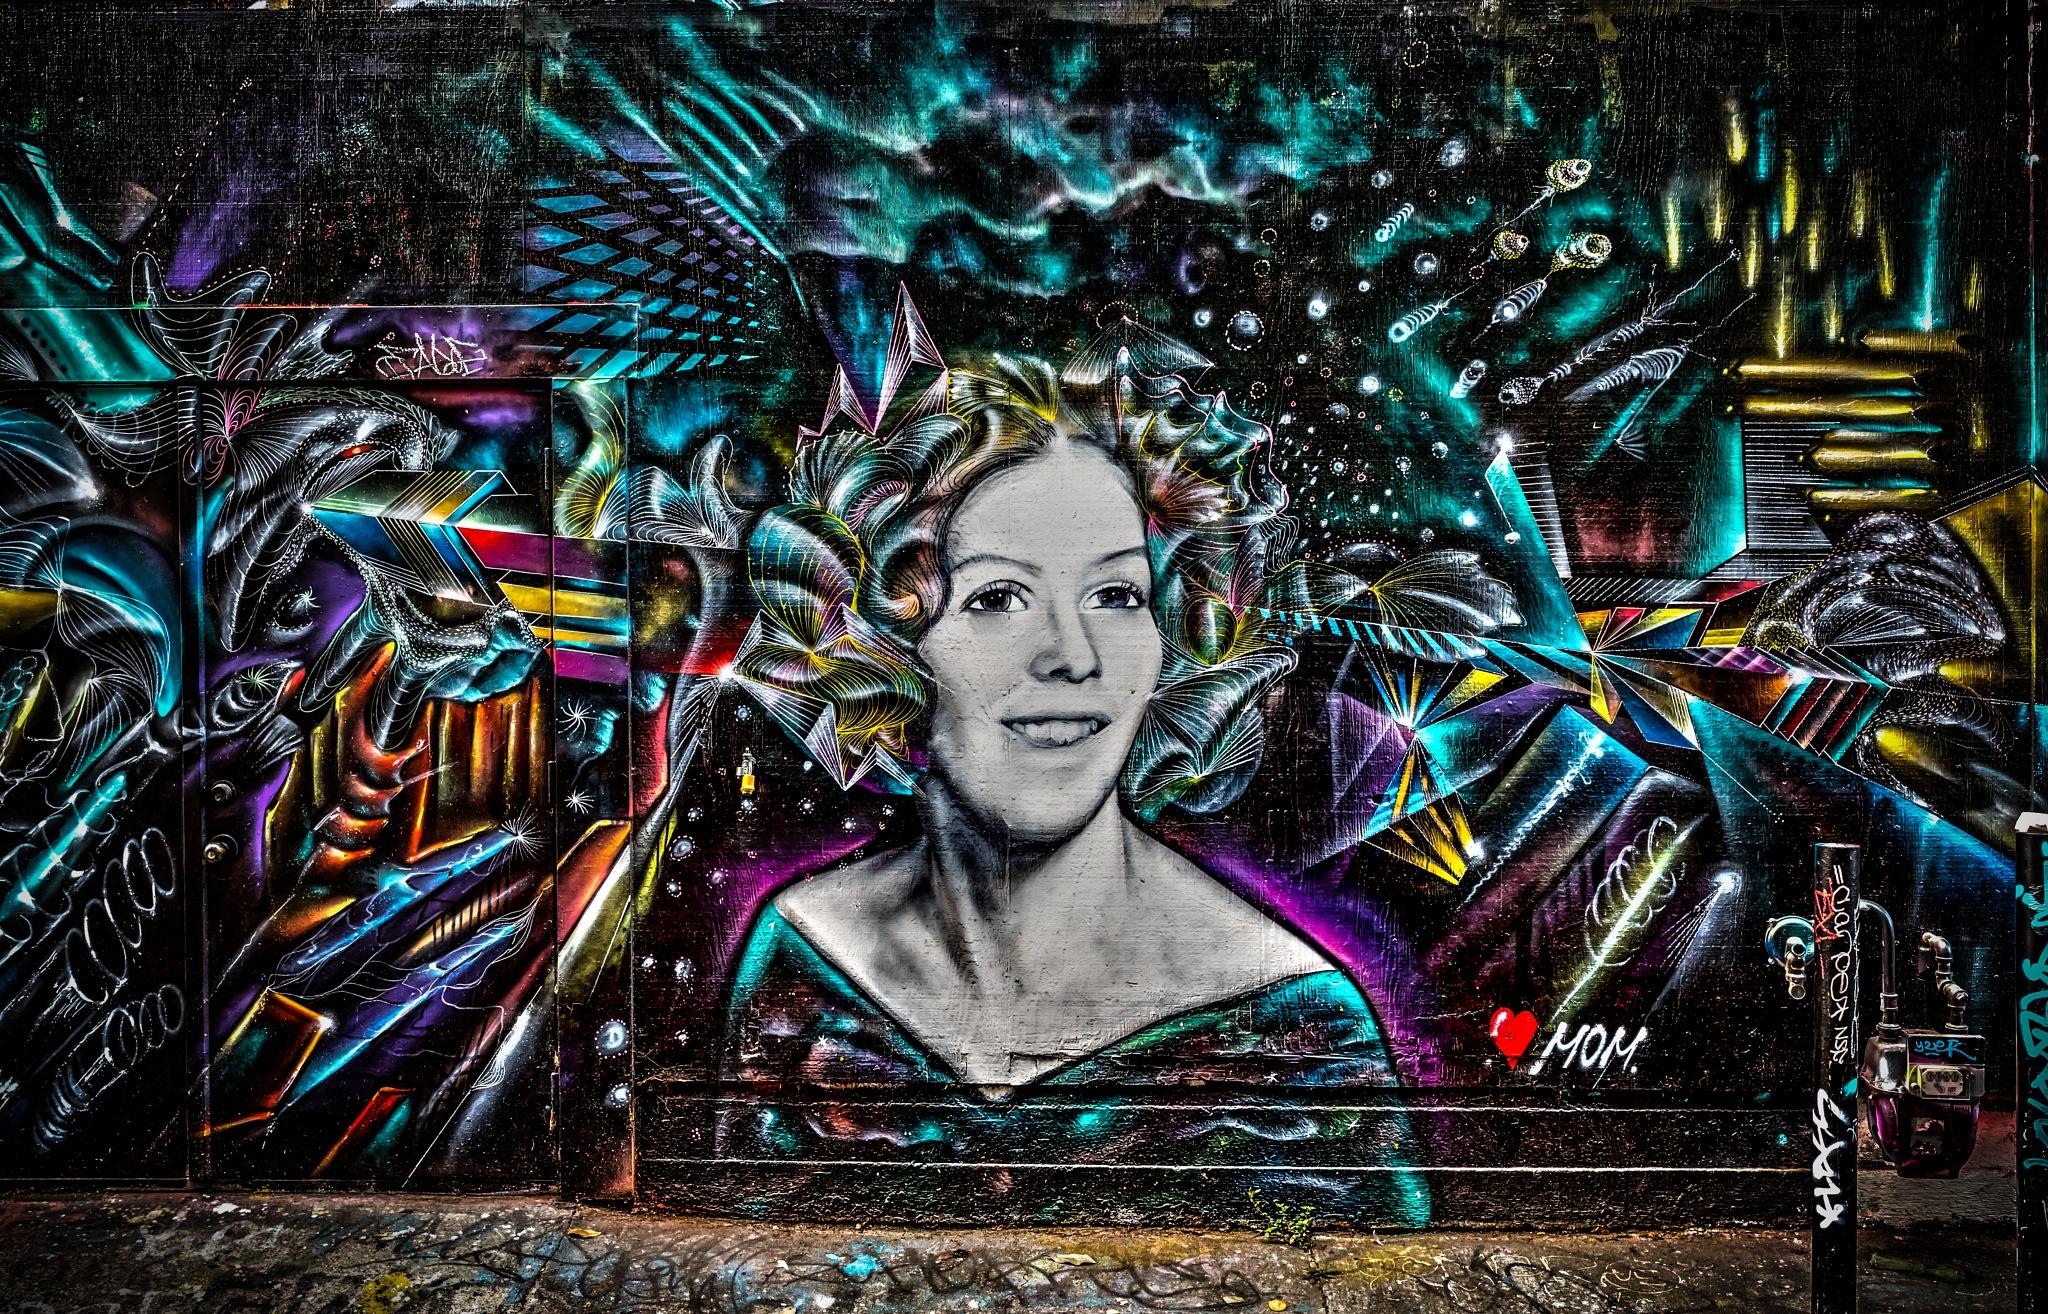 Street art San Francisco by Mahmoud Shokry